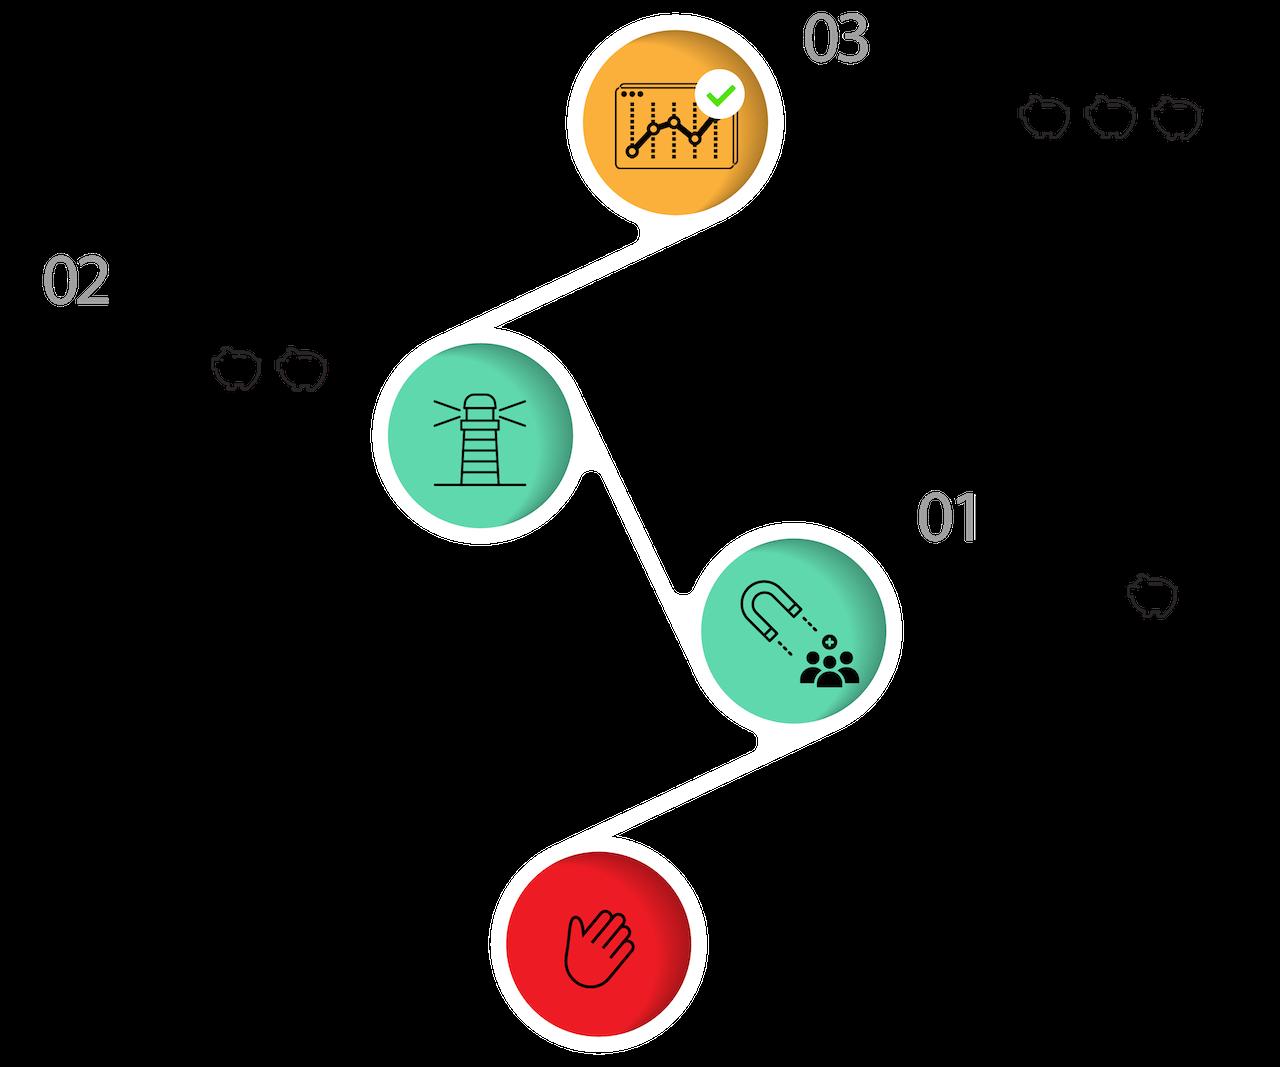 Roadmap of automatic testing